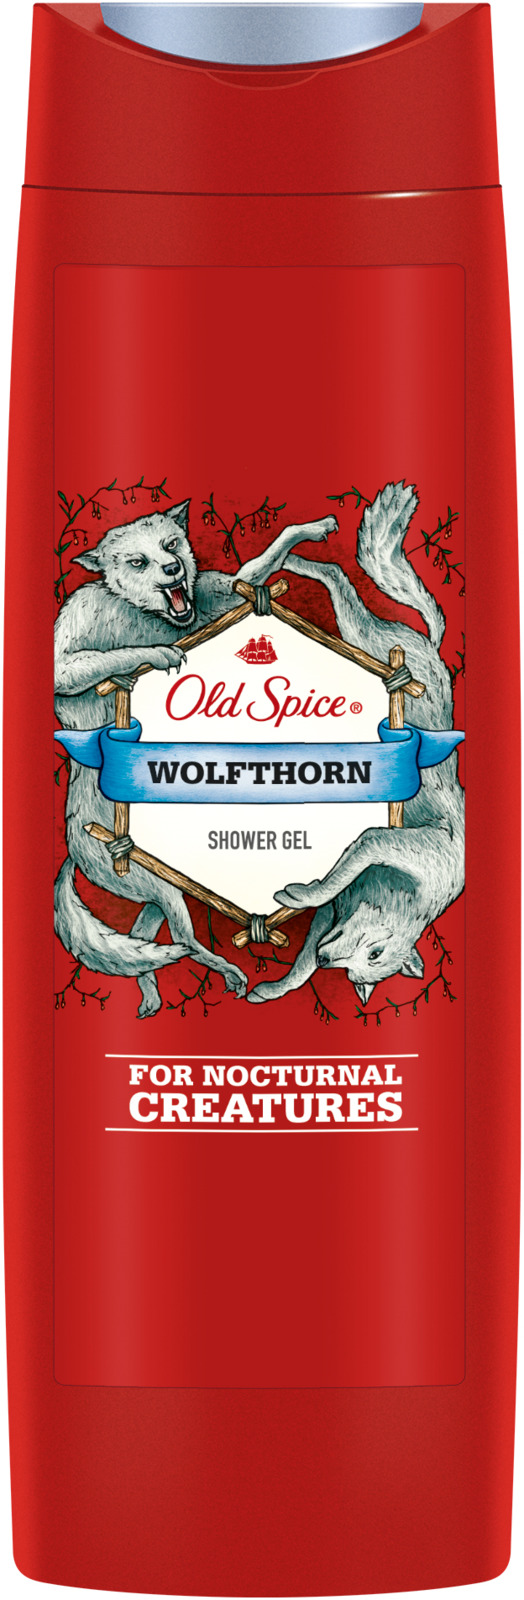 Гель для душа Old Spice Wolfthorn, 400 мл